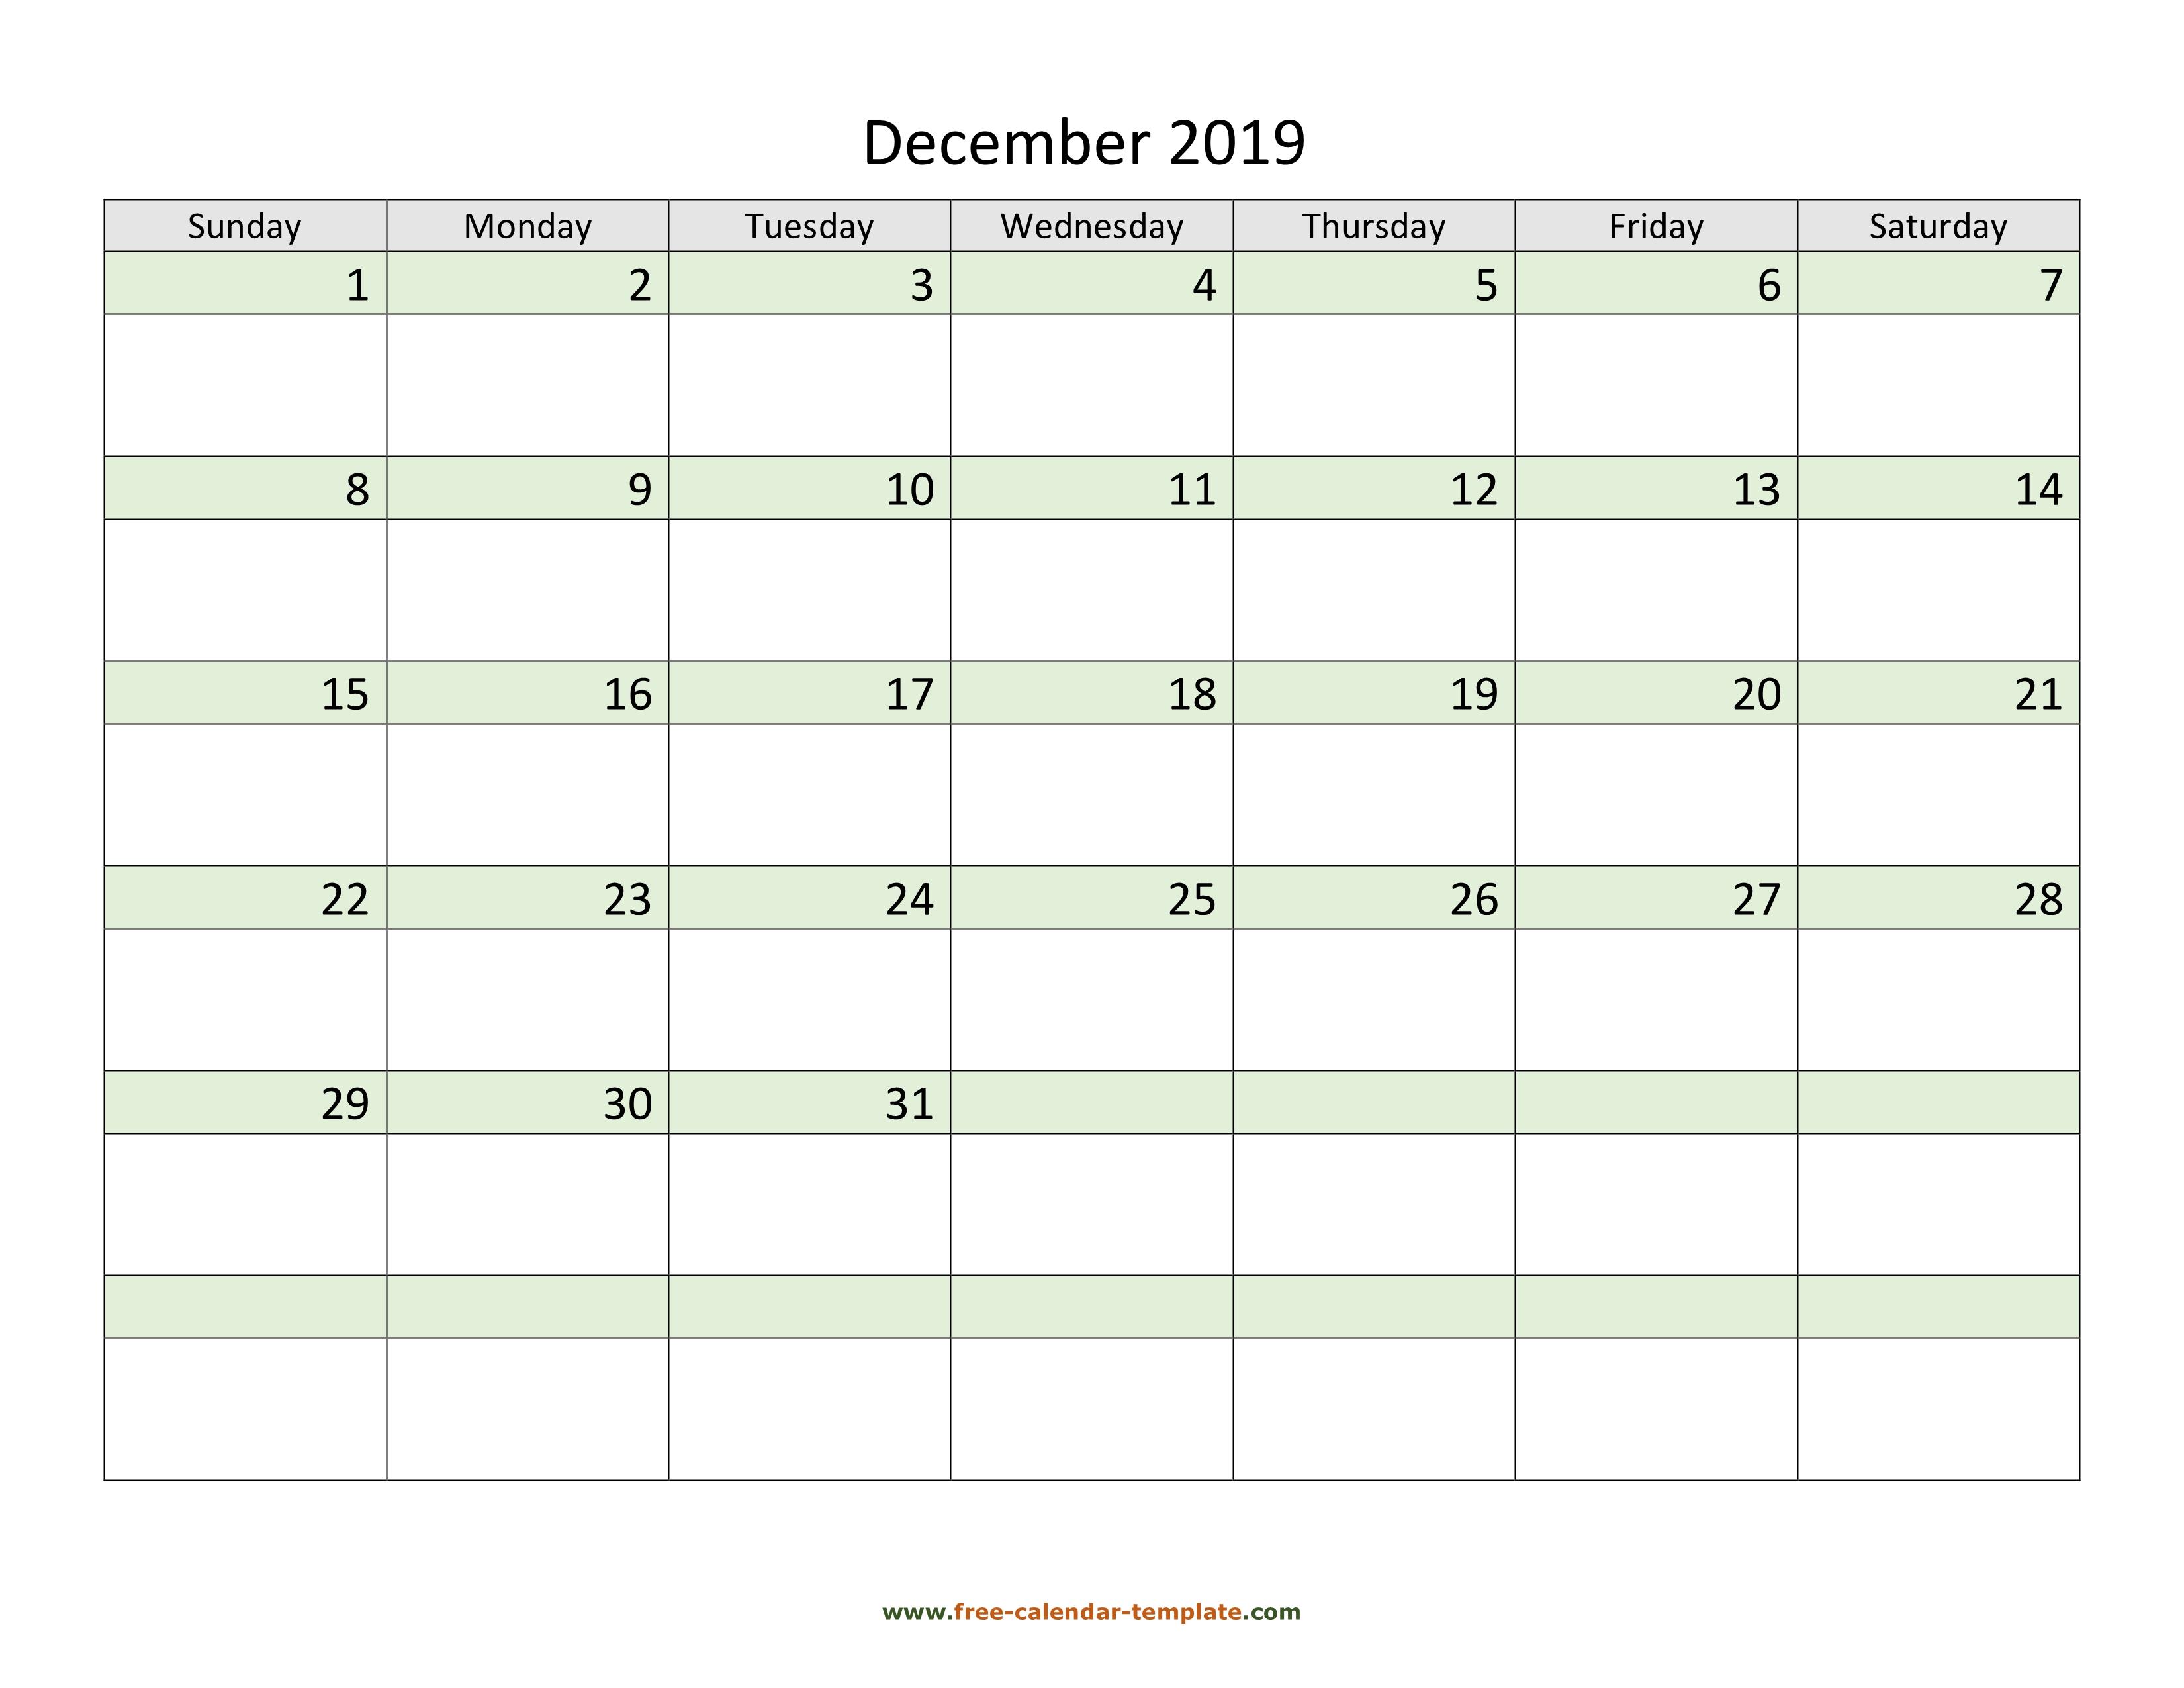 Free Horizontal December 2019 Calendar Free December 2019 Calendar, coloring on each day (horizontal